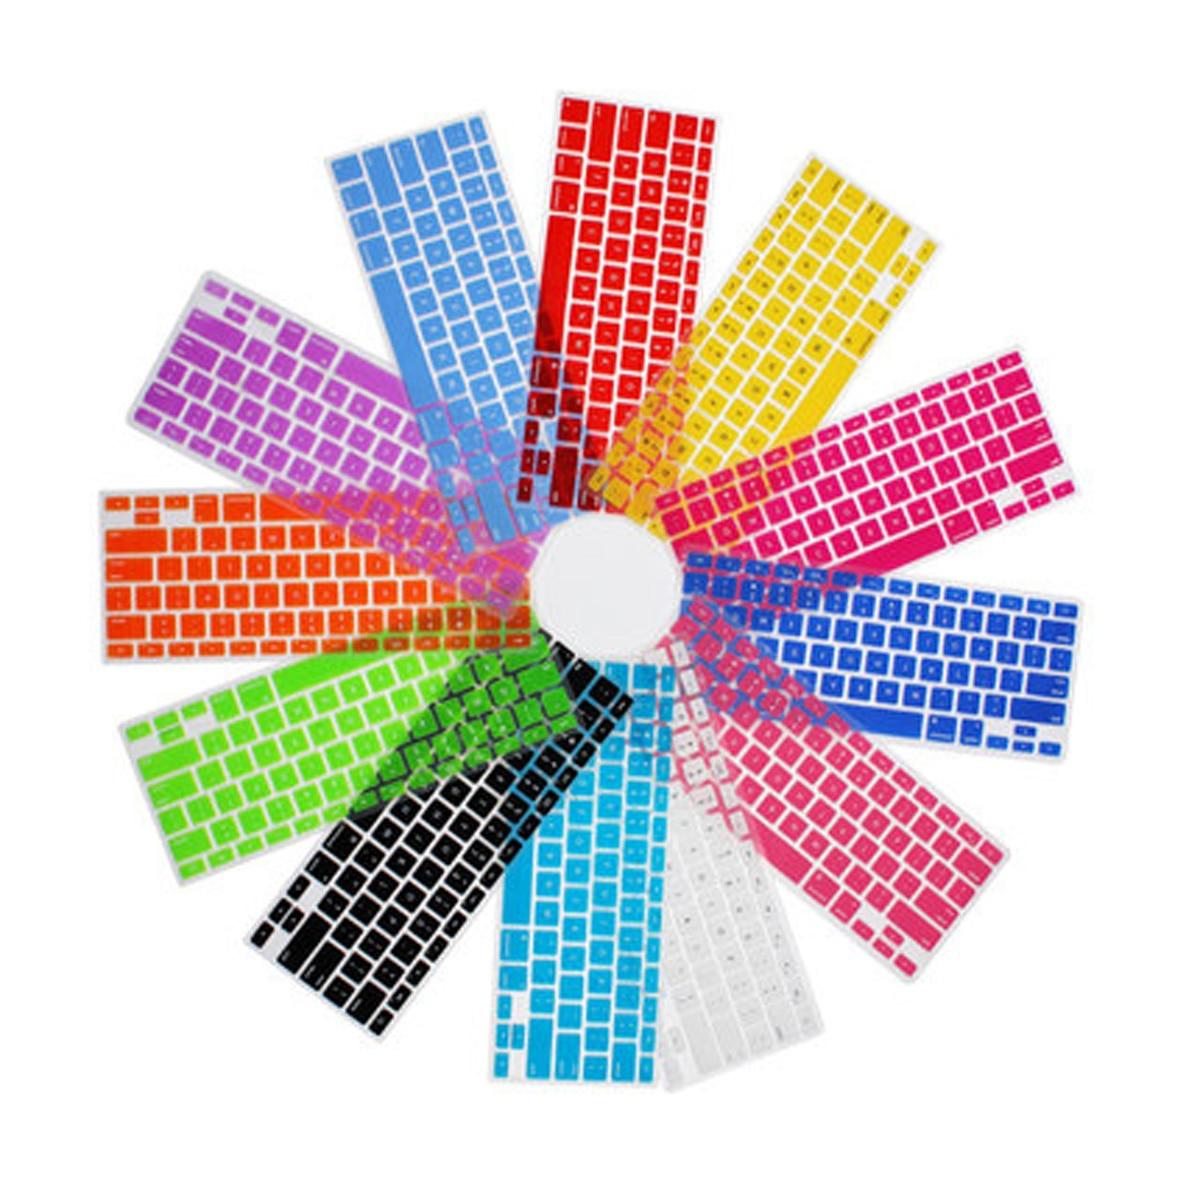 freeship EU/UK Layout English Colorful Silicone Protection sticker Keyboard Skin for 12' inch apple Mac Macbook/Macbook12